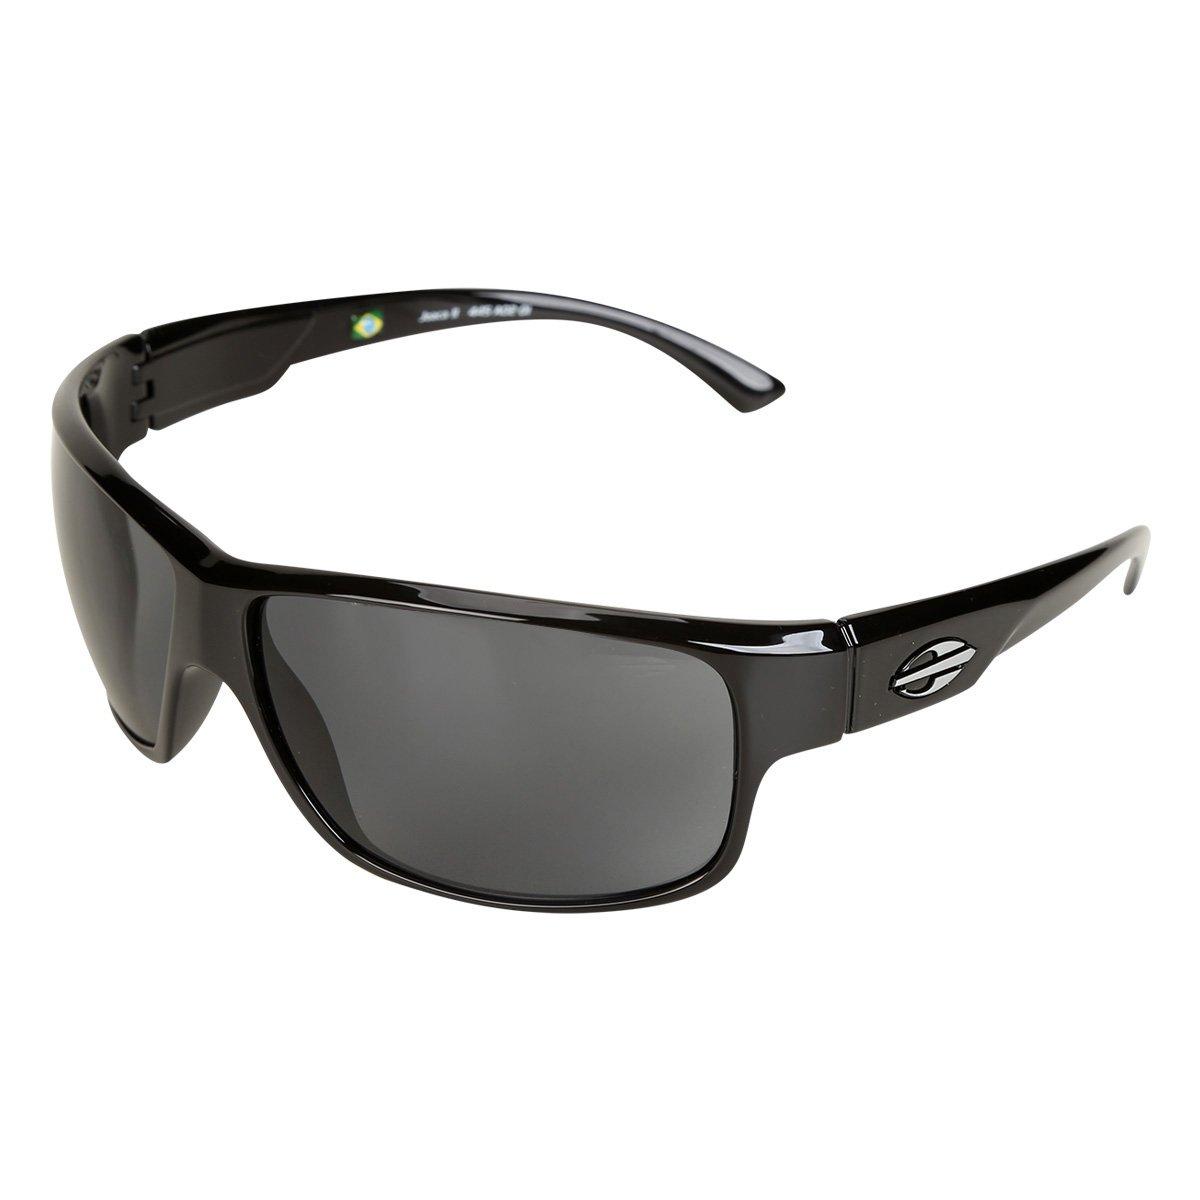 3a467848981c8 Óculos de Sol Mormaii Joaca Masculino - Compre Agora   Netshoes